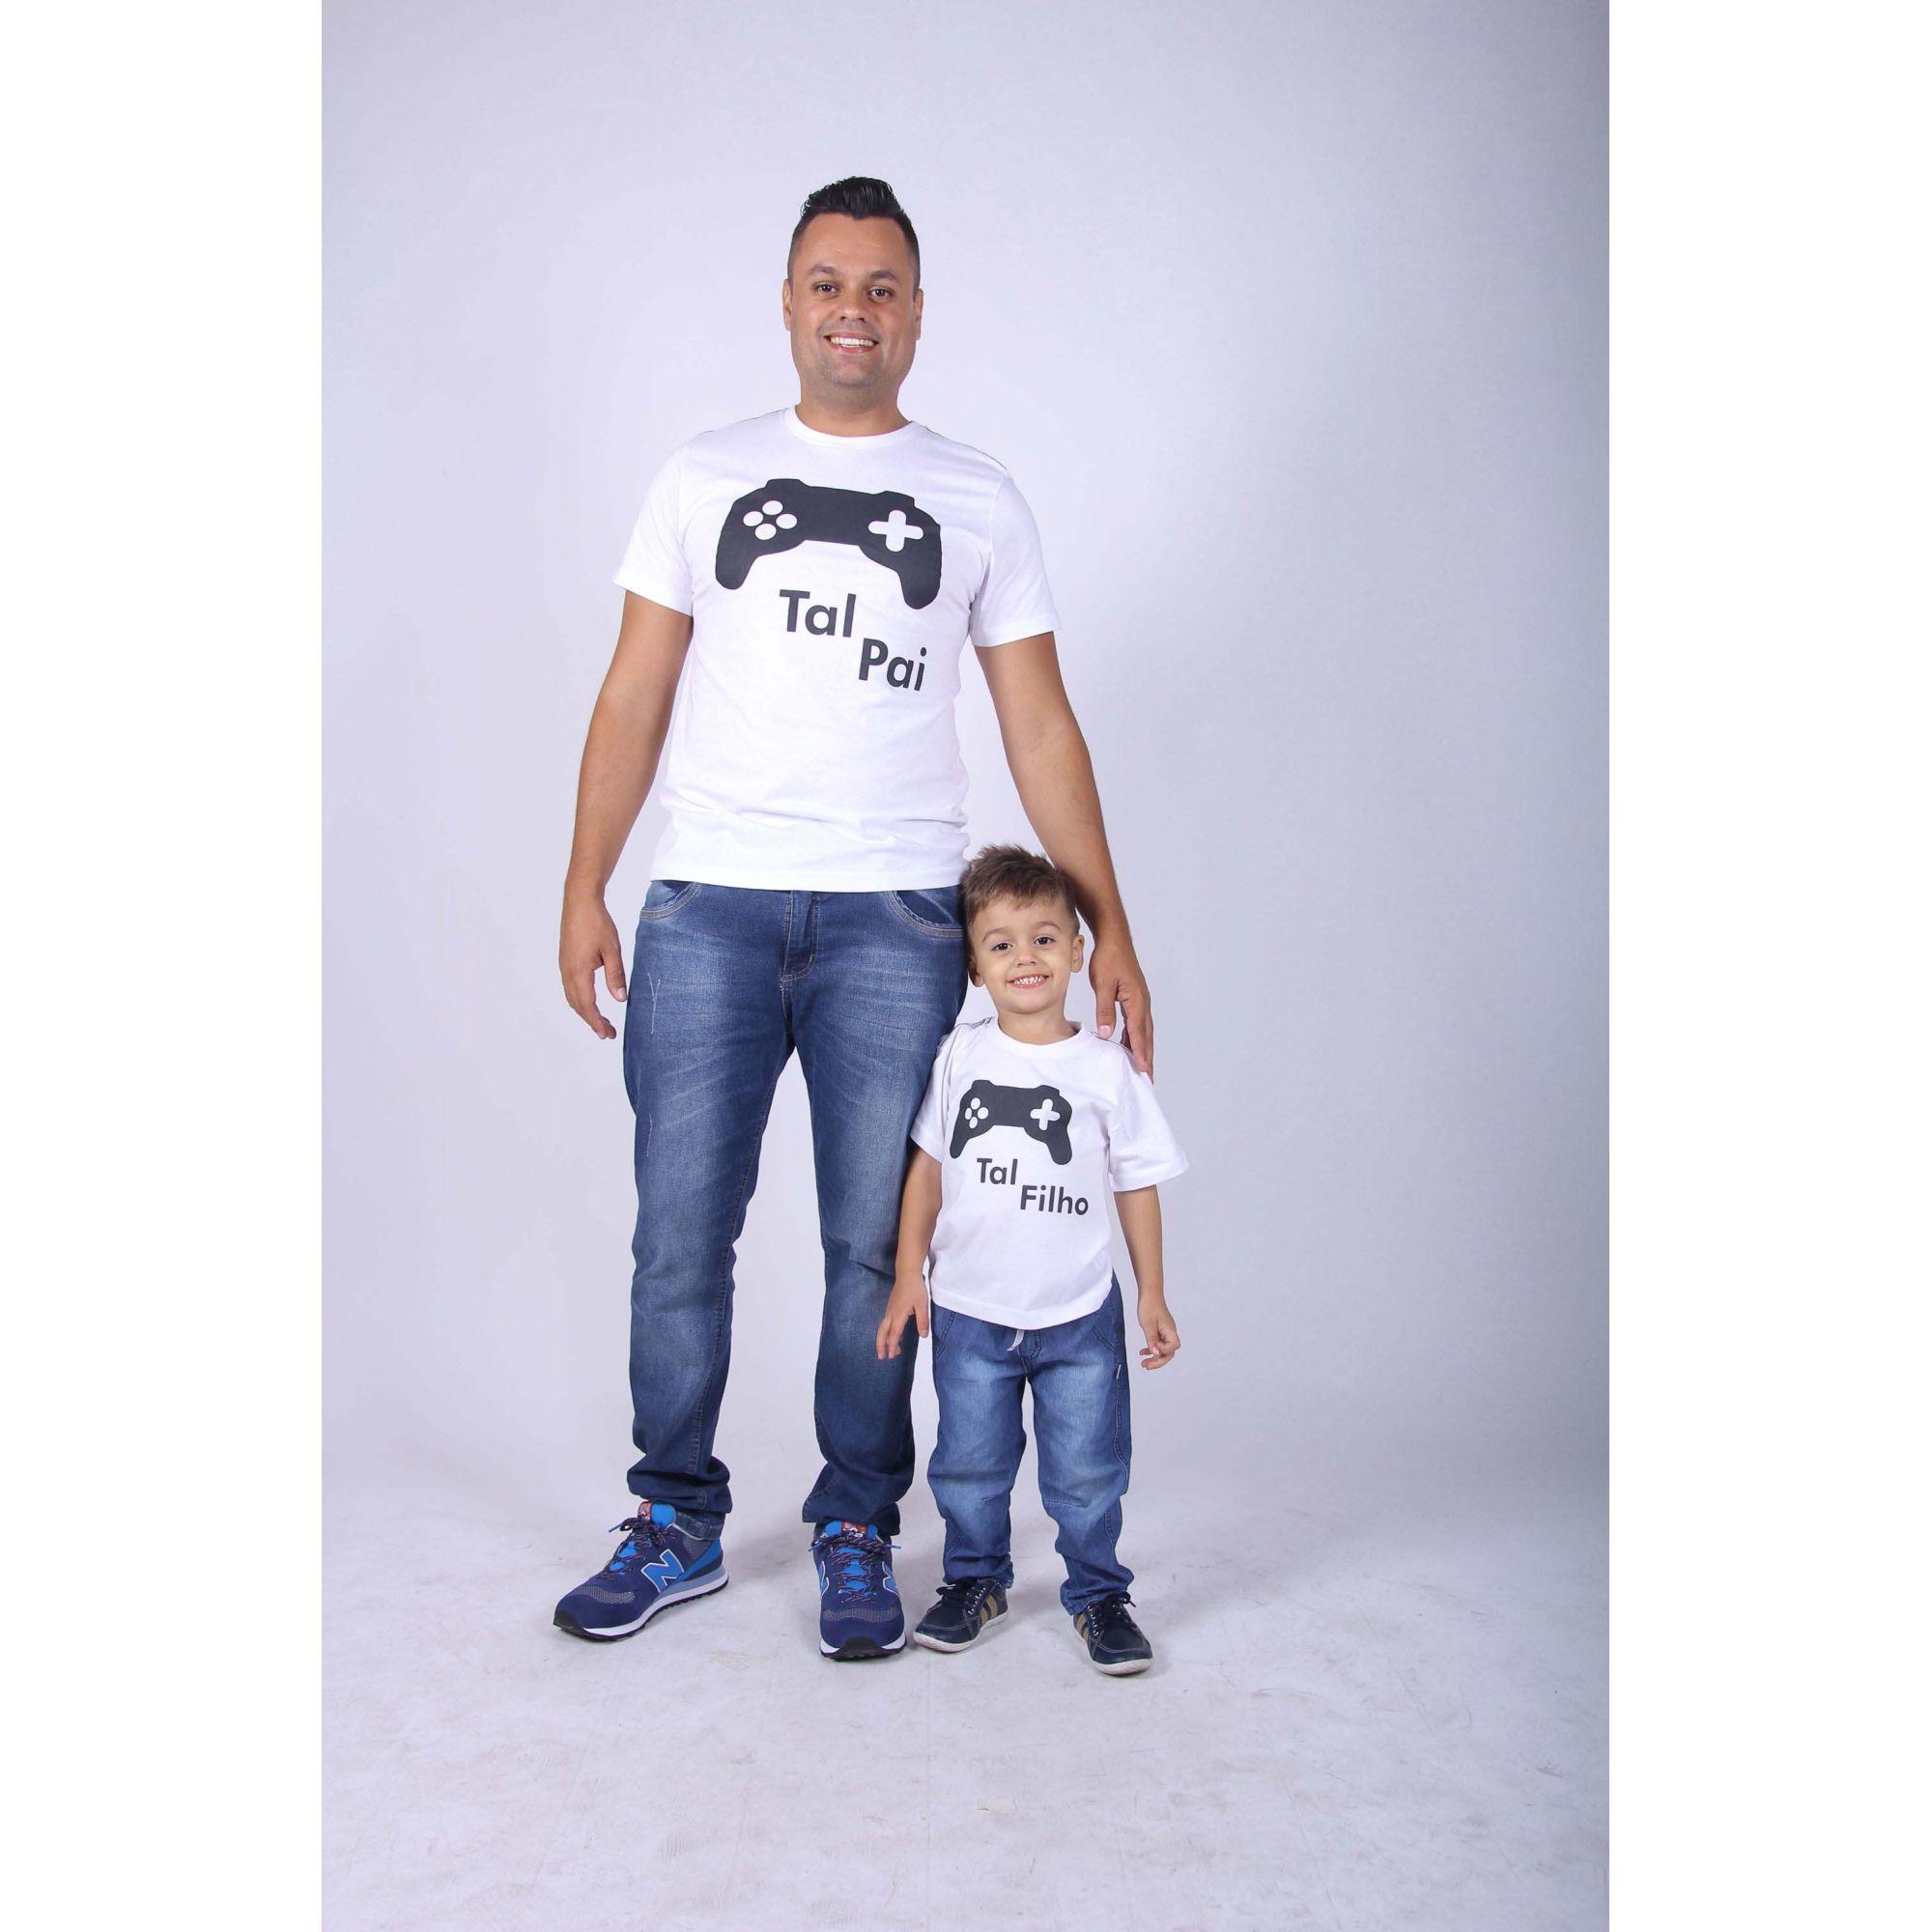 PAI E FILHO > Kit 02 Camisetas Vídeo game [Coleção Tal Pai Tal Filho]  - Heitor Fashion Brazil